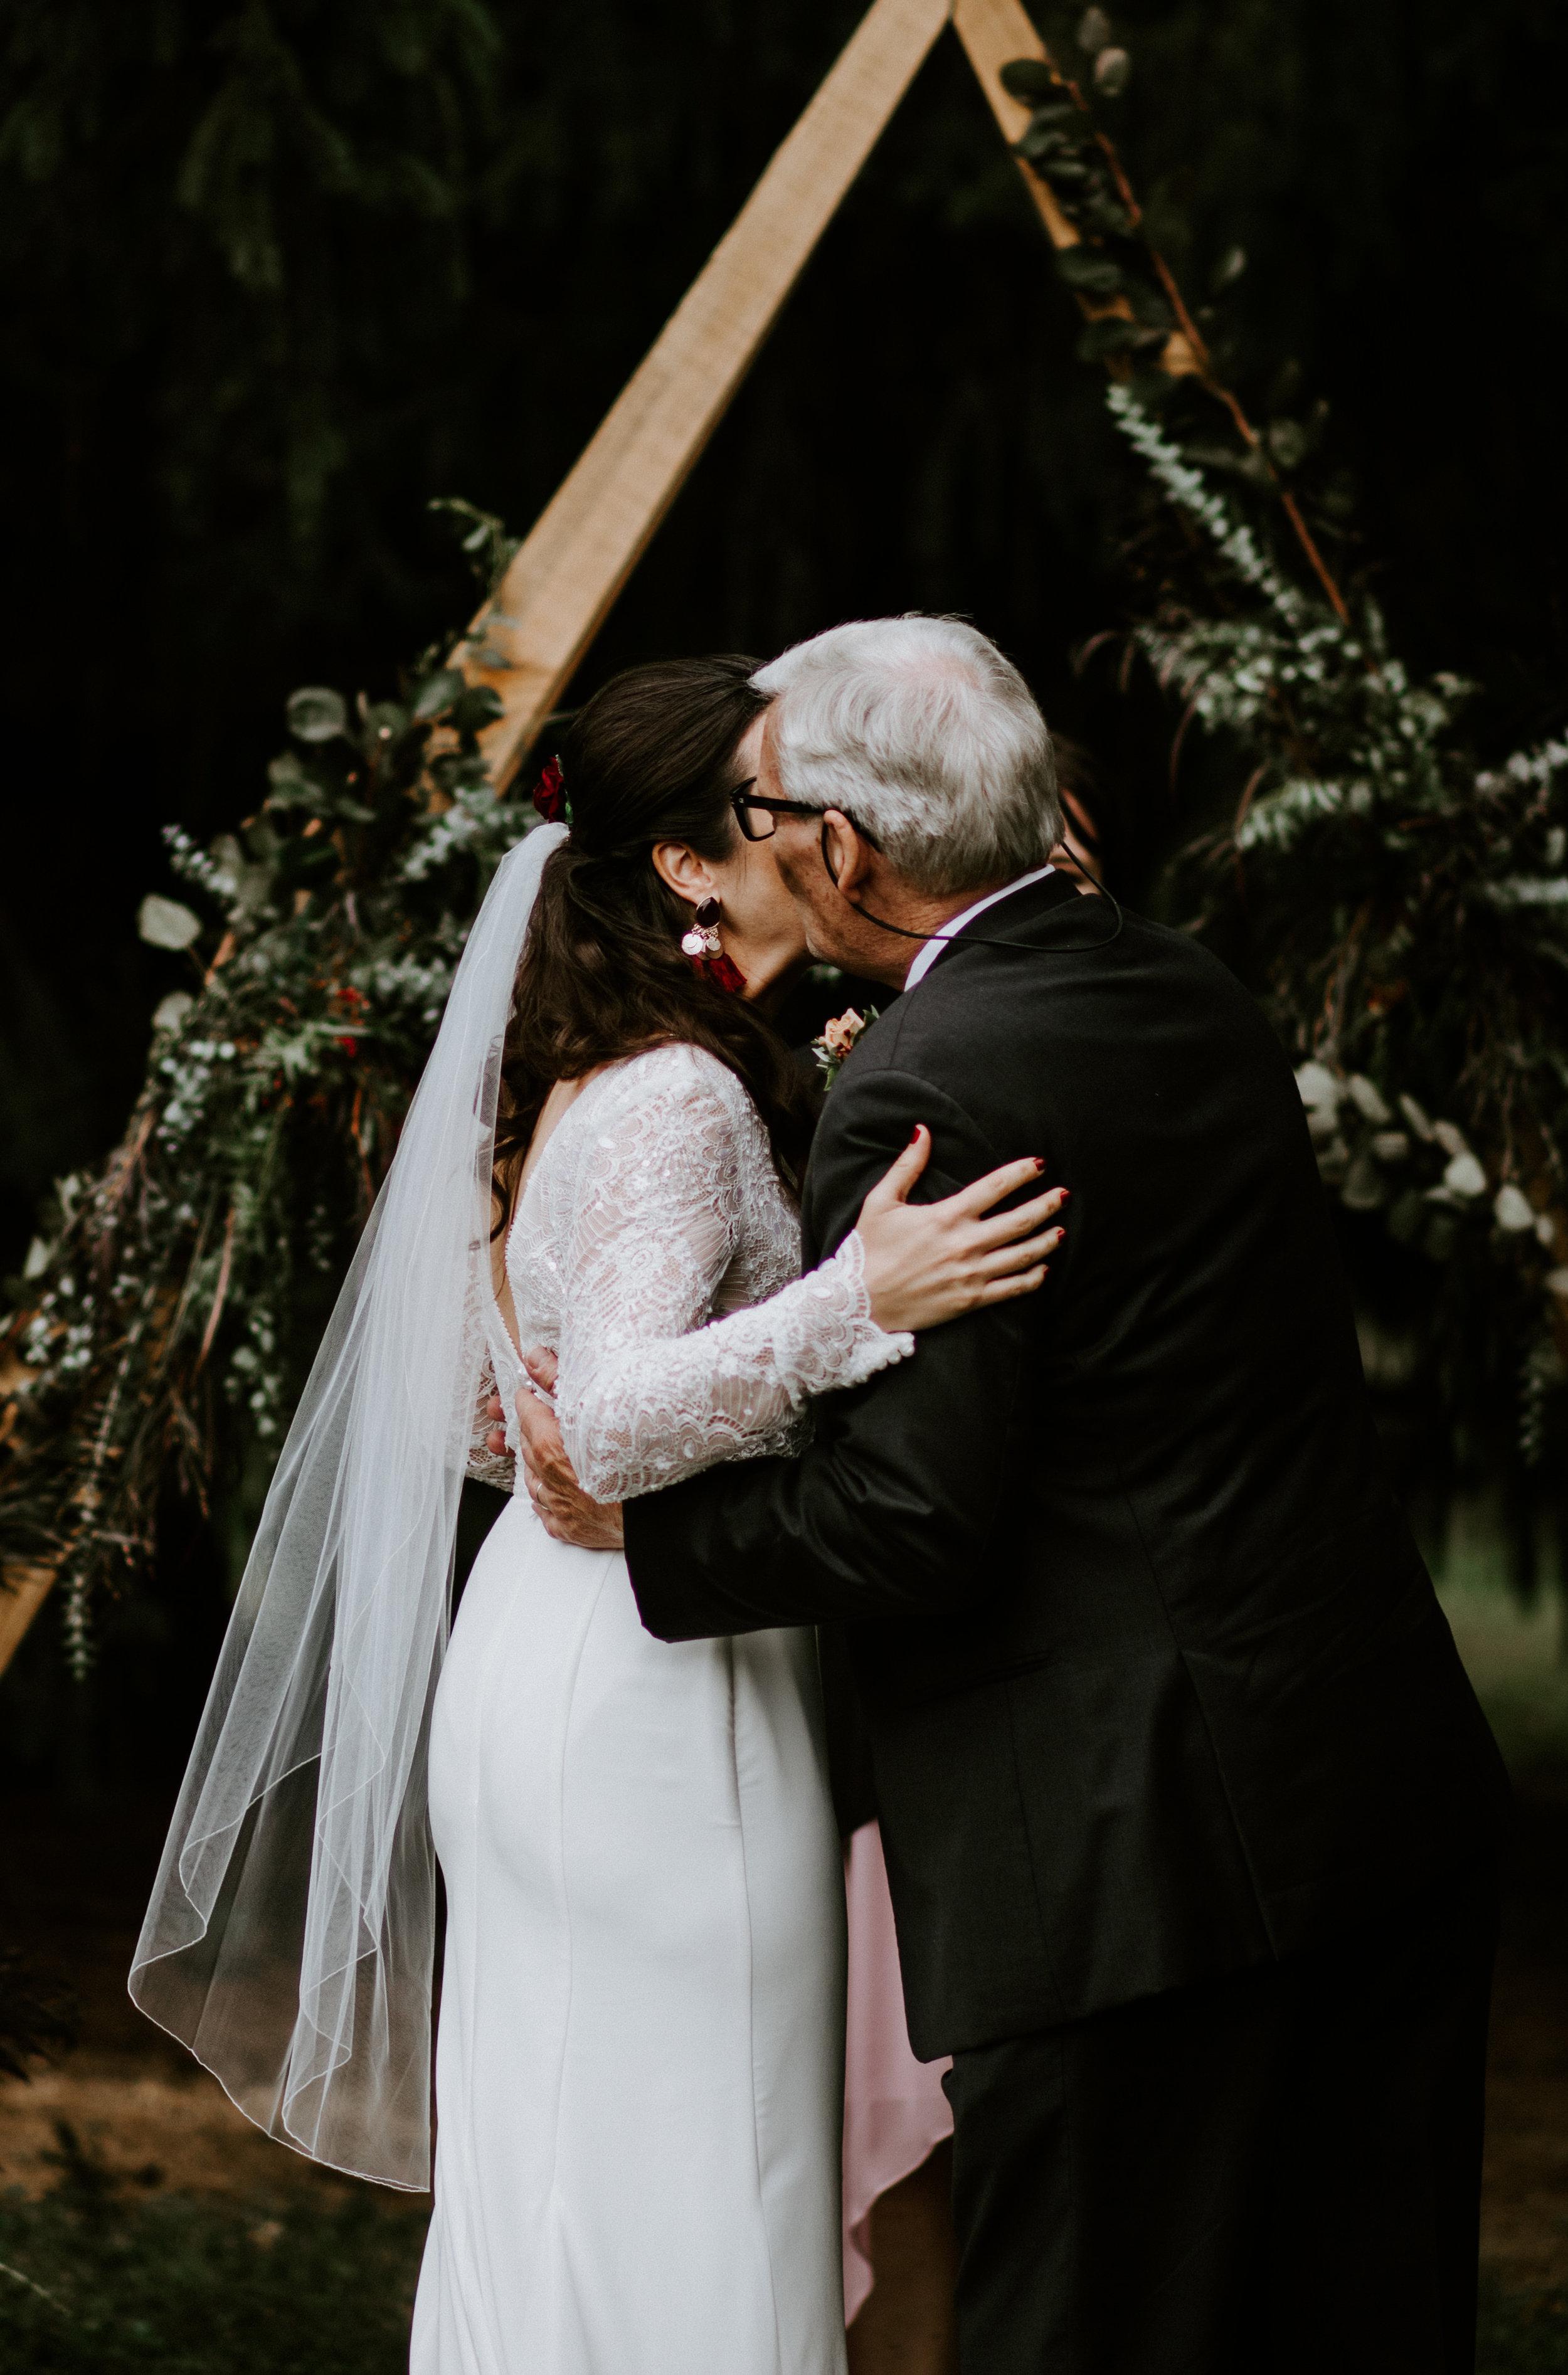 st-louis-missouri-wedding-photographer-tower-grove-park-sheldon-concert-hall-steph+phil-463.jpg